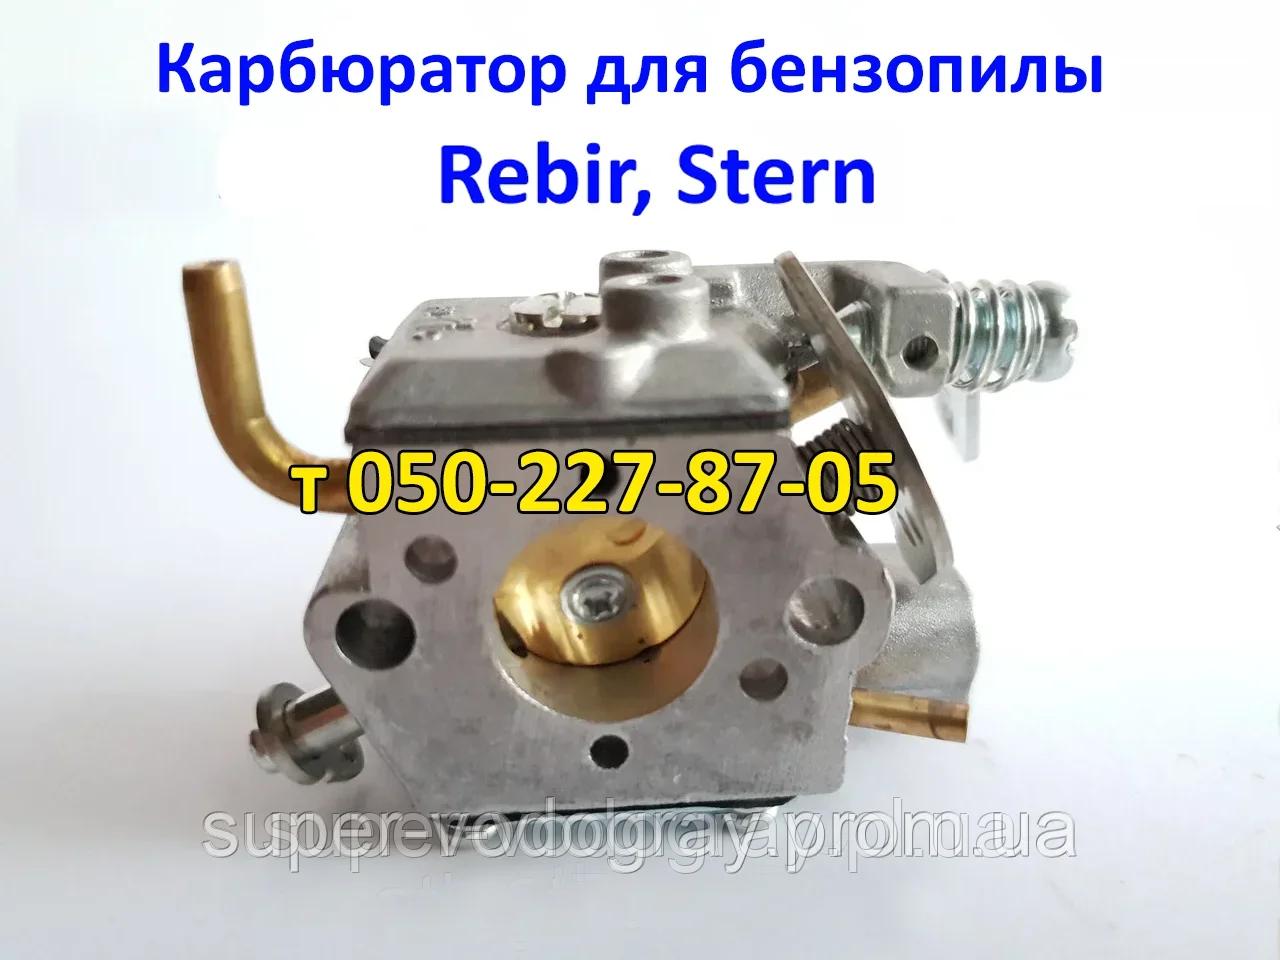 Карбюратор для бензопилы  Rebir, Stern